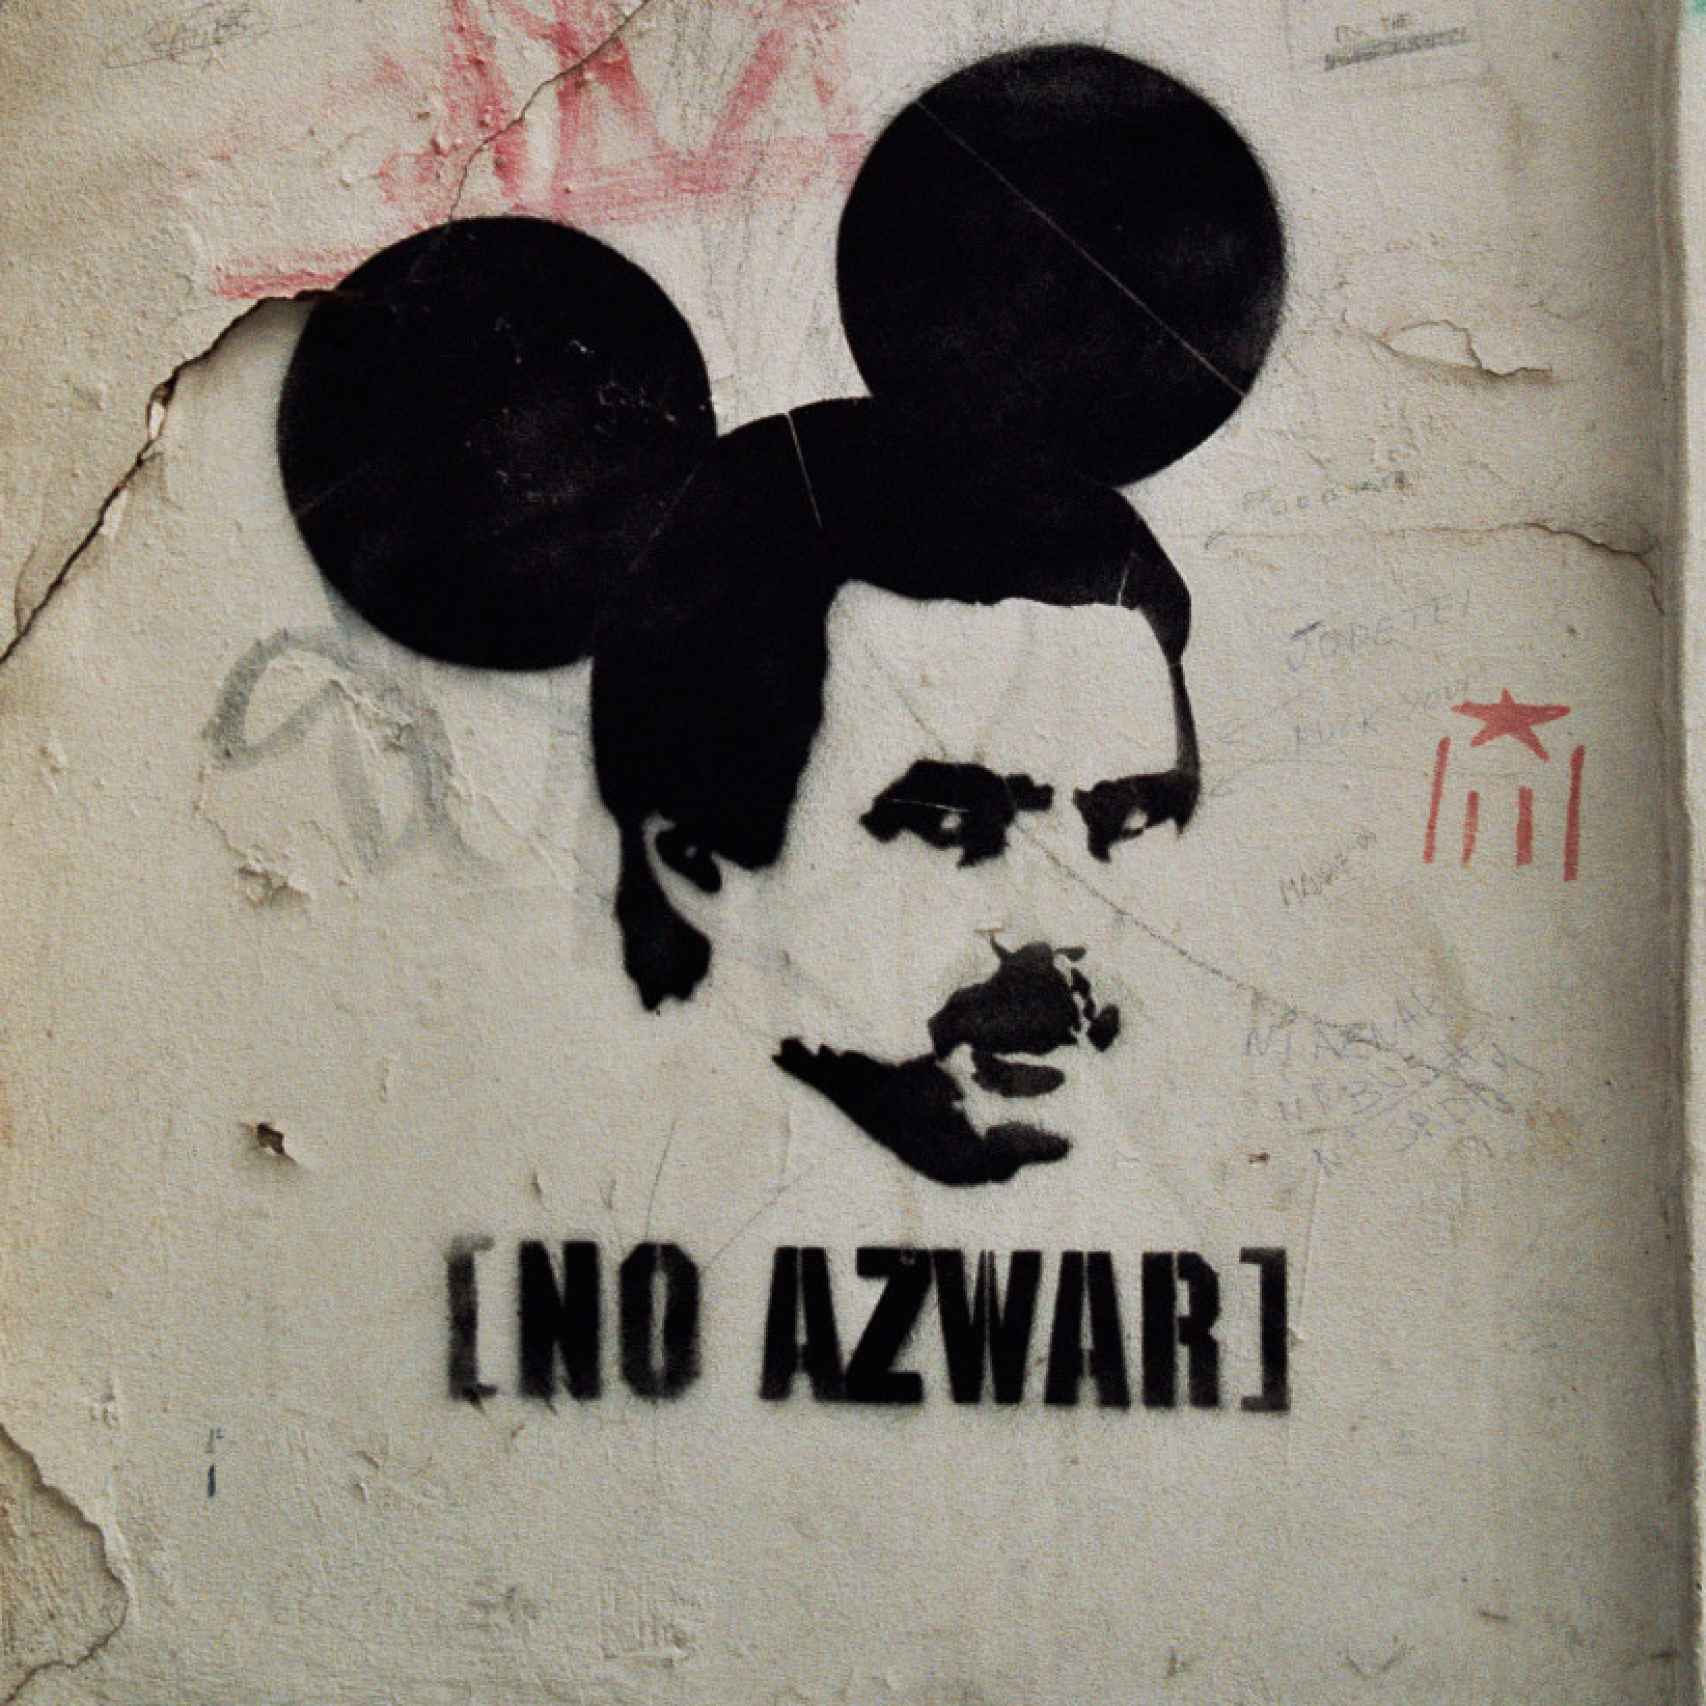 No Azwar en Bruselas, año 2004, por Noaz.